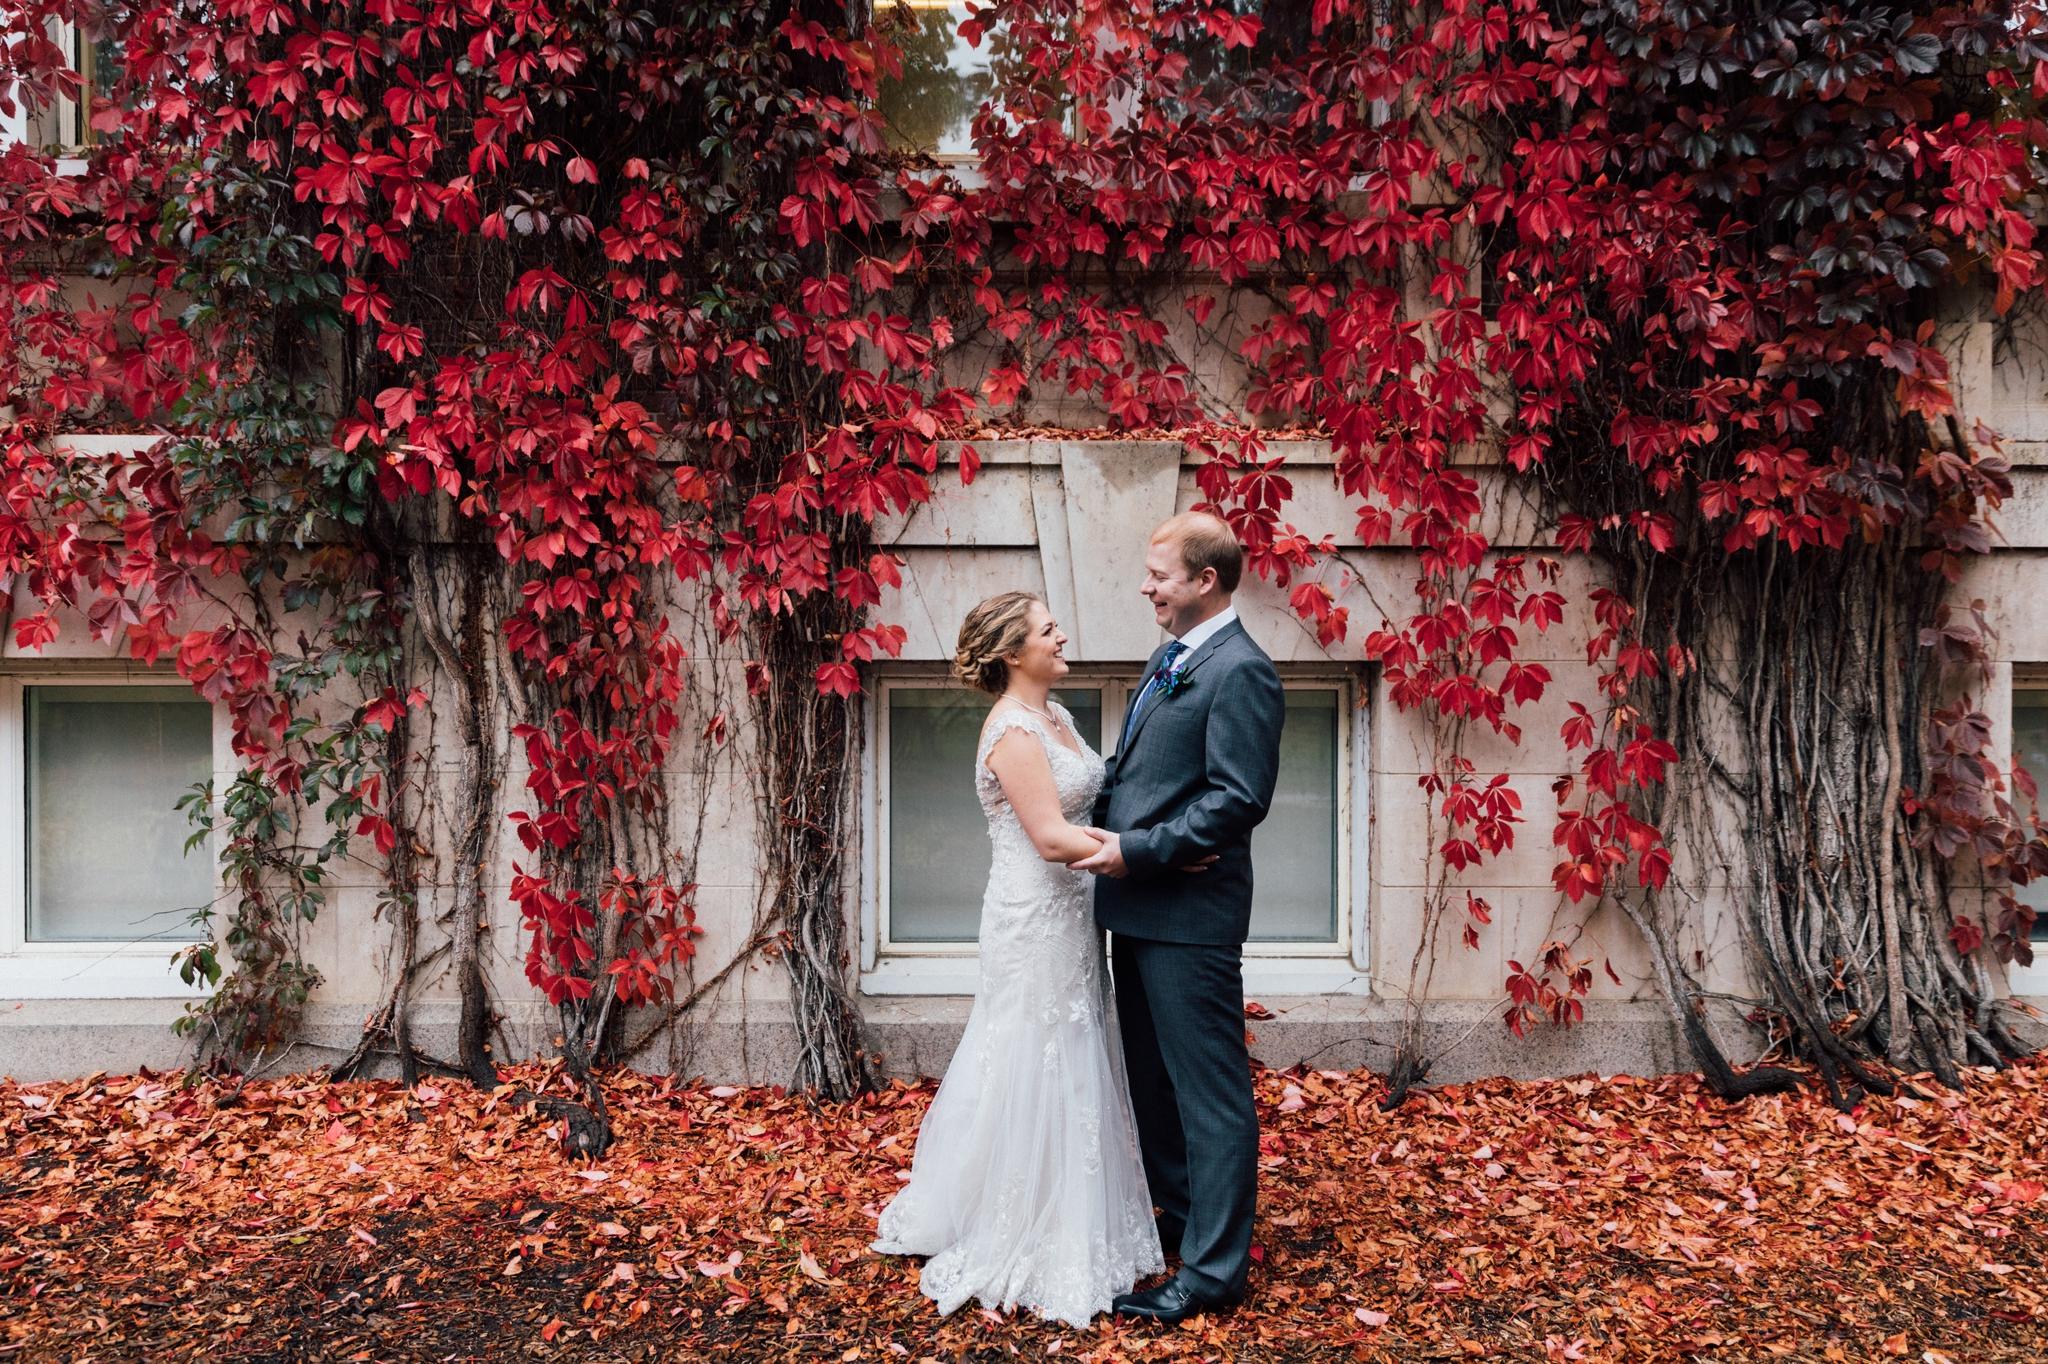 Fall wedding photos at the University of Alberta in Edmonton